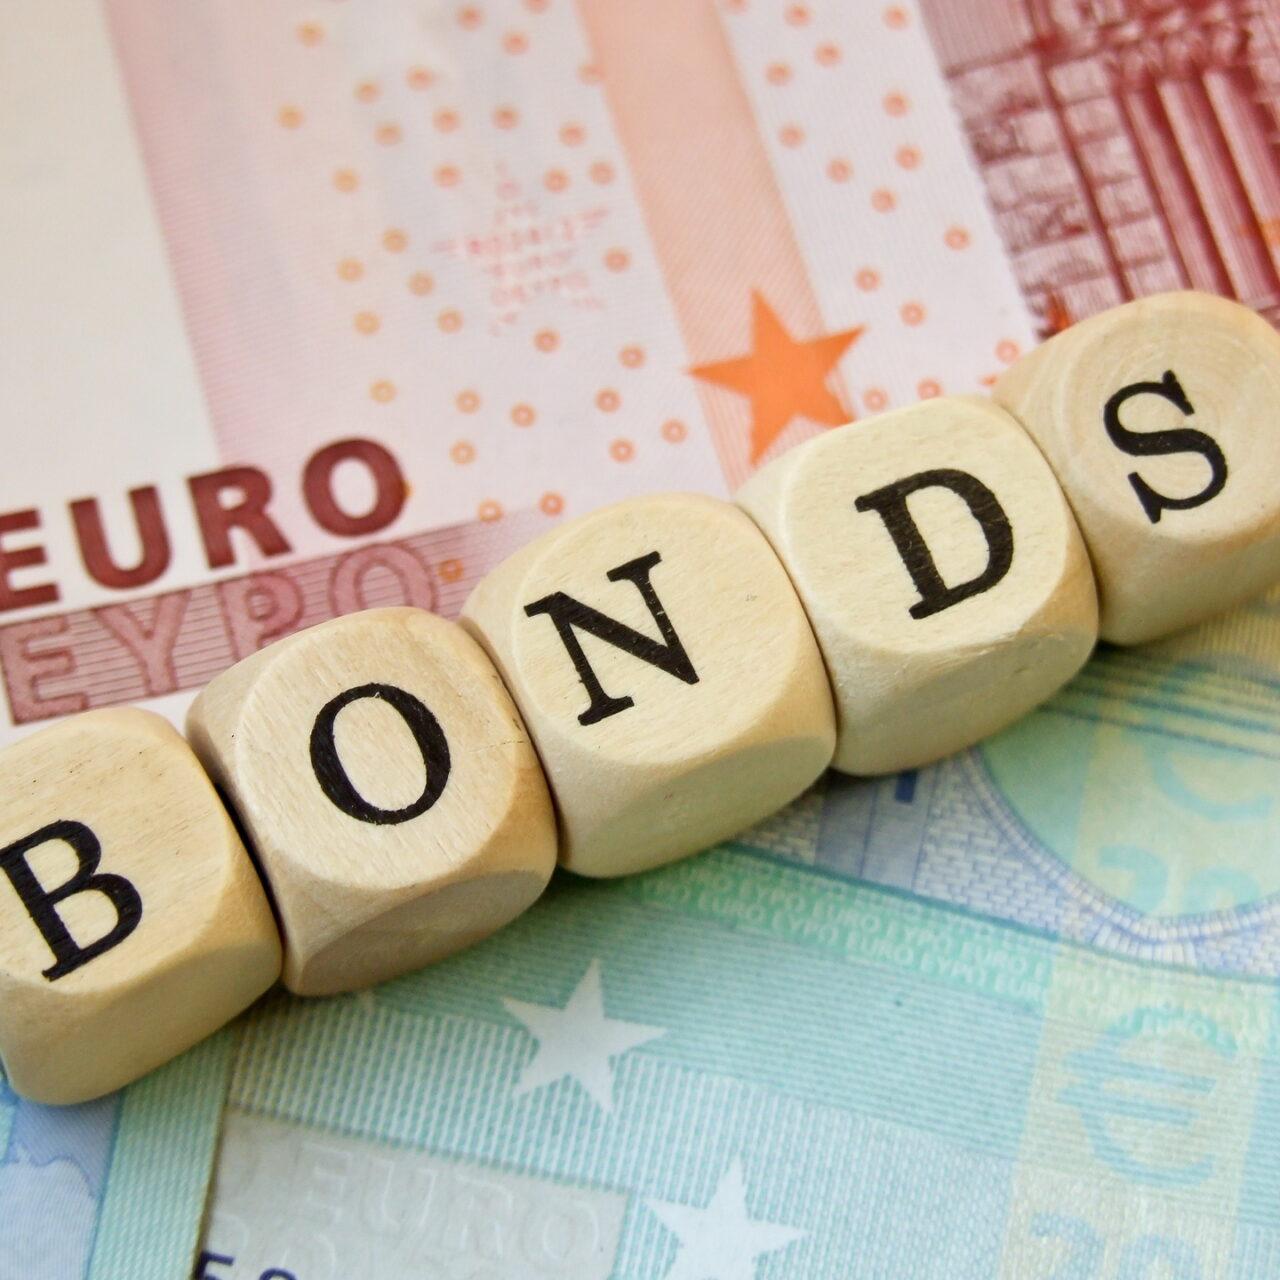 Eurobonds zur Finanzierung des Corona-Wiederaufbaufonds